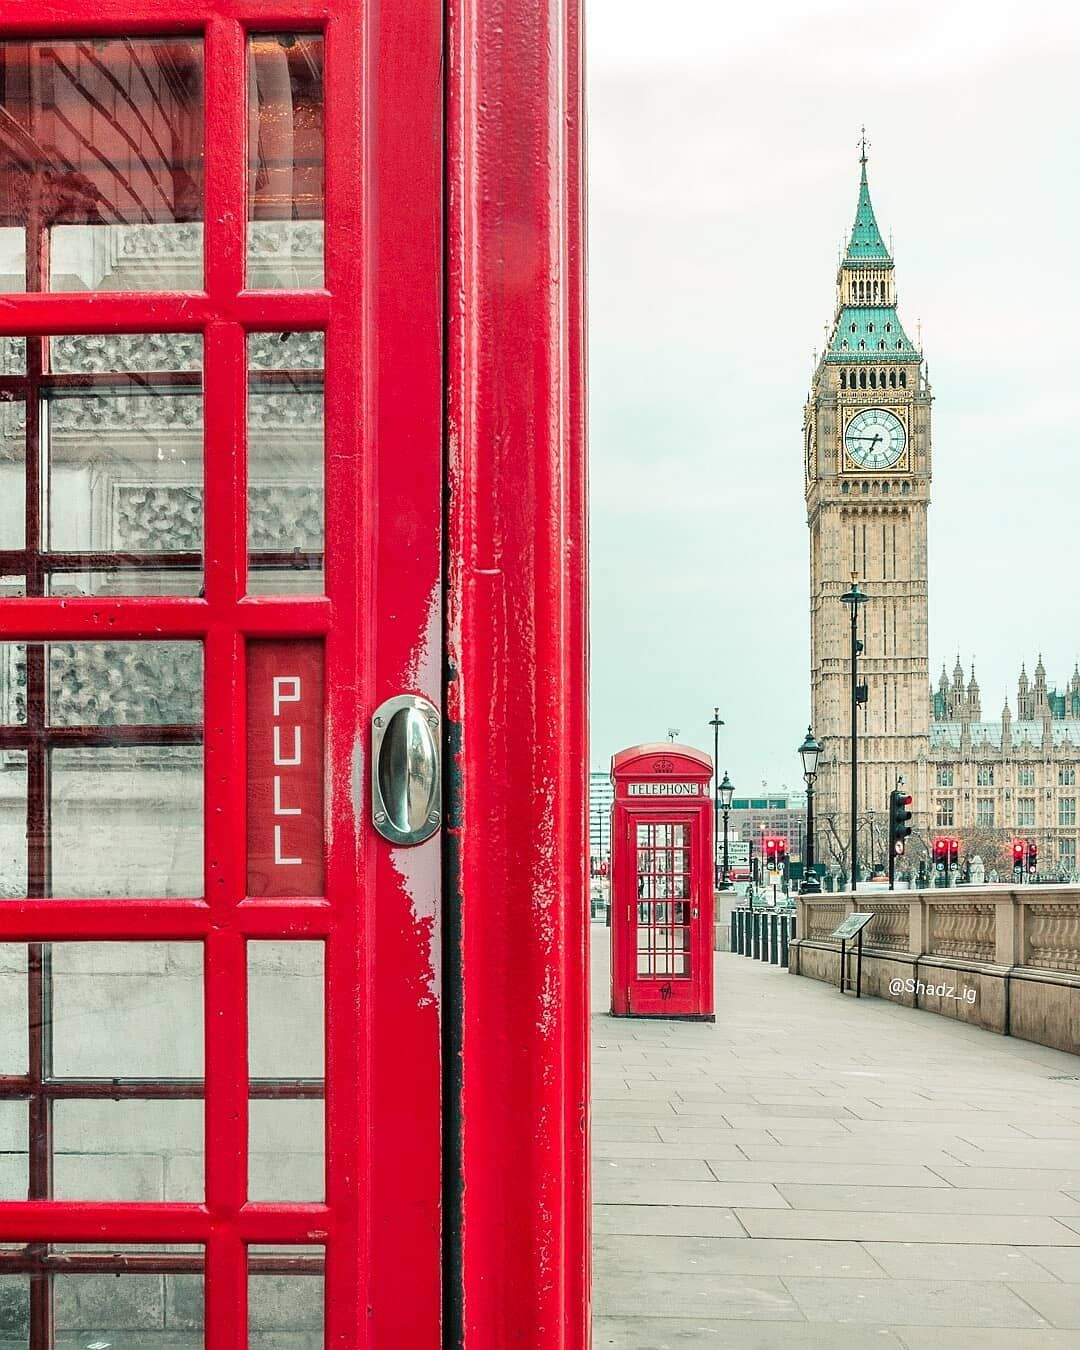 London S Iconic Telephone Box And Big Ben Photo By Shadzii Instagram Shadz Ig London Photographer London Photos London